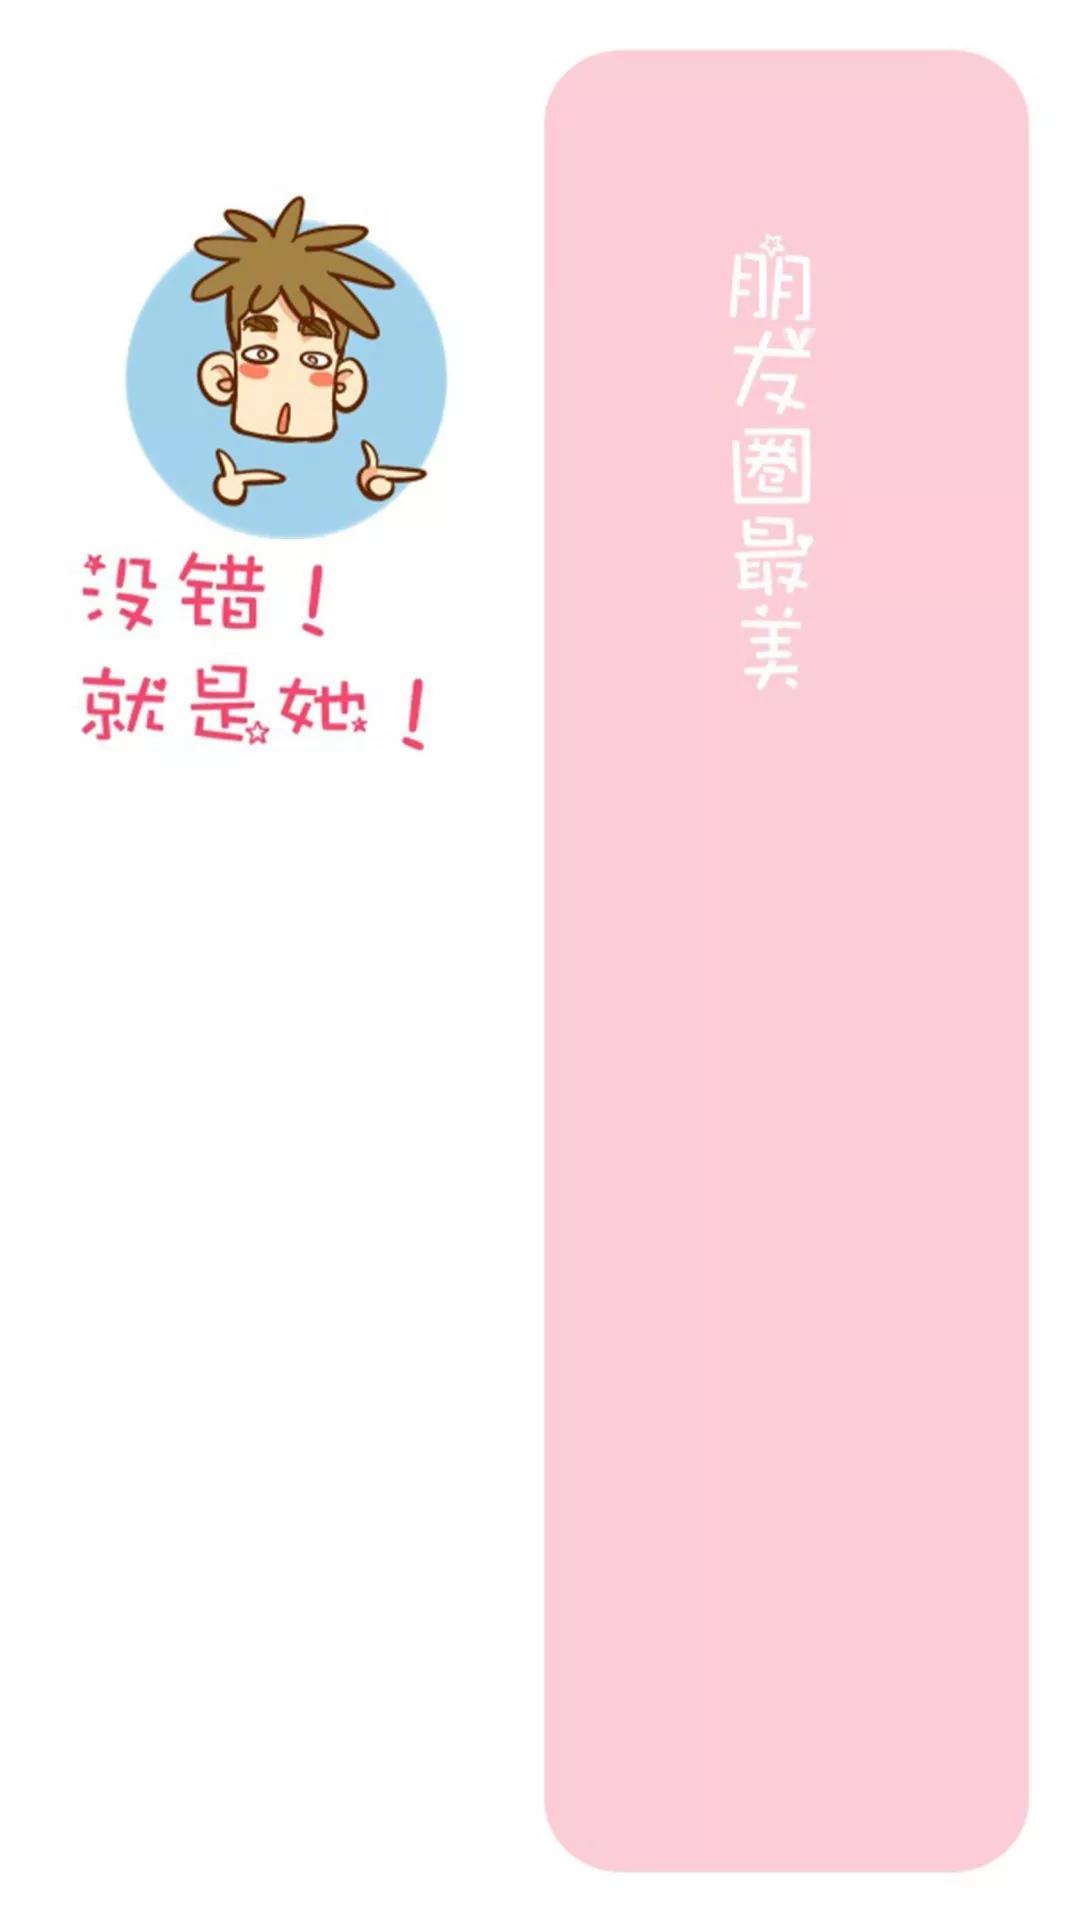 201504021532117946